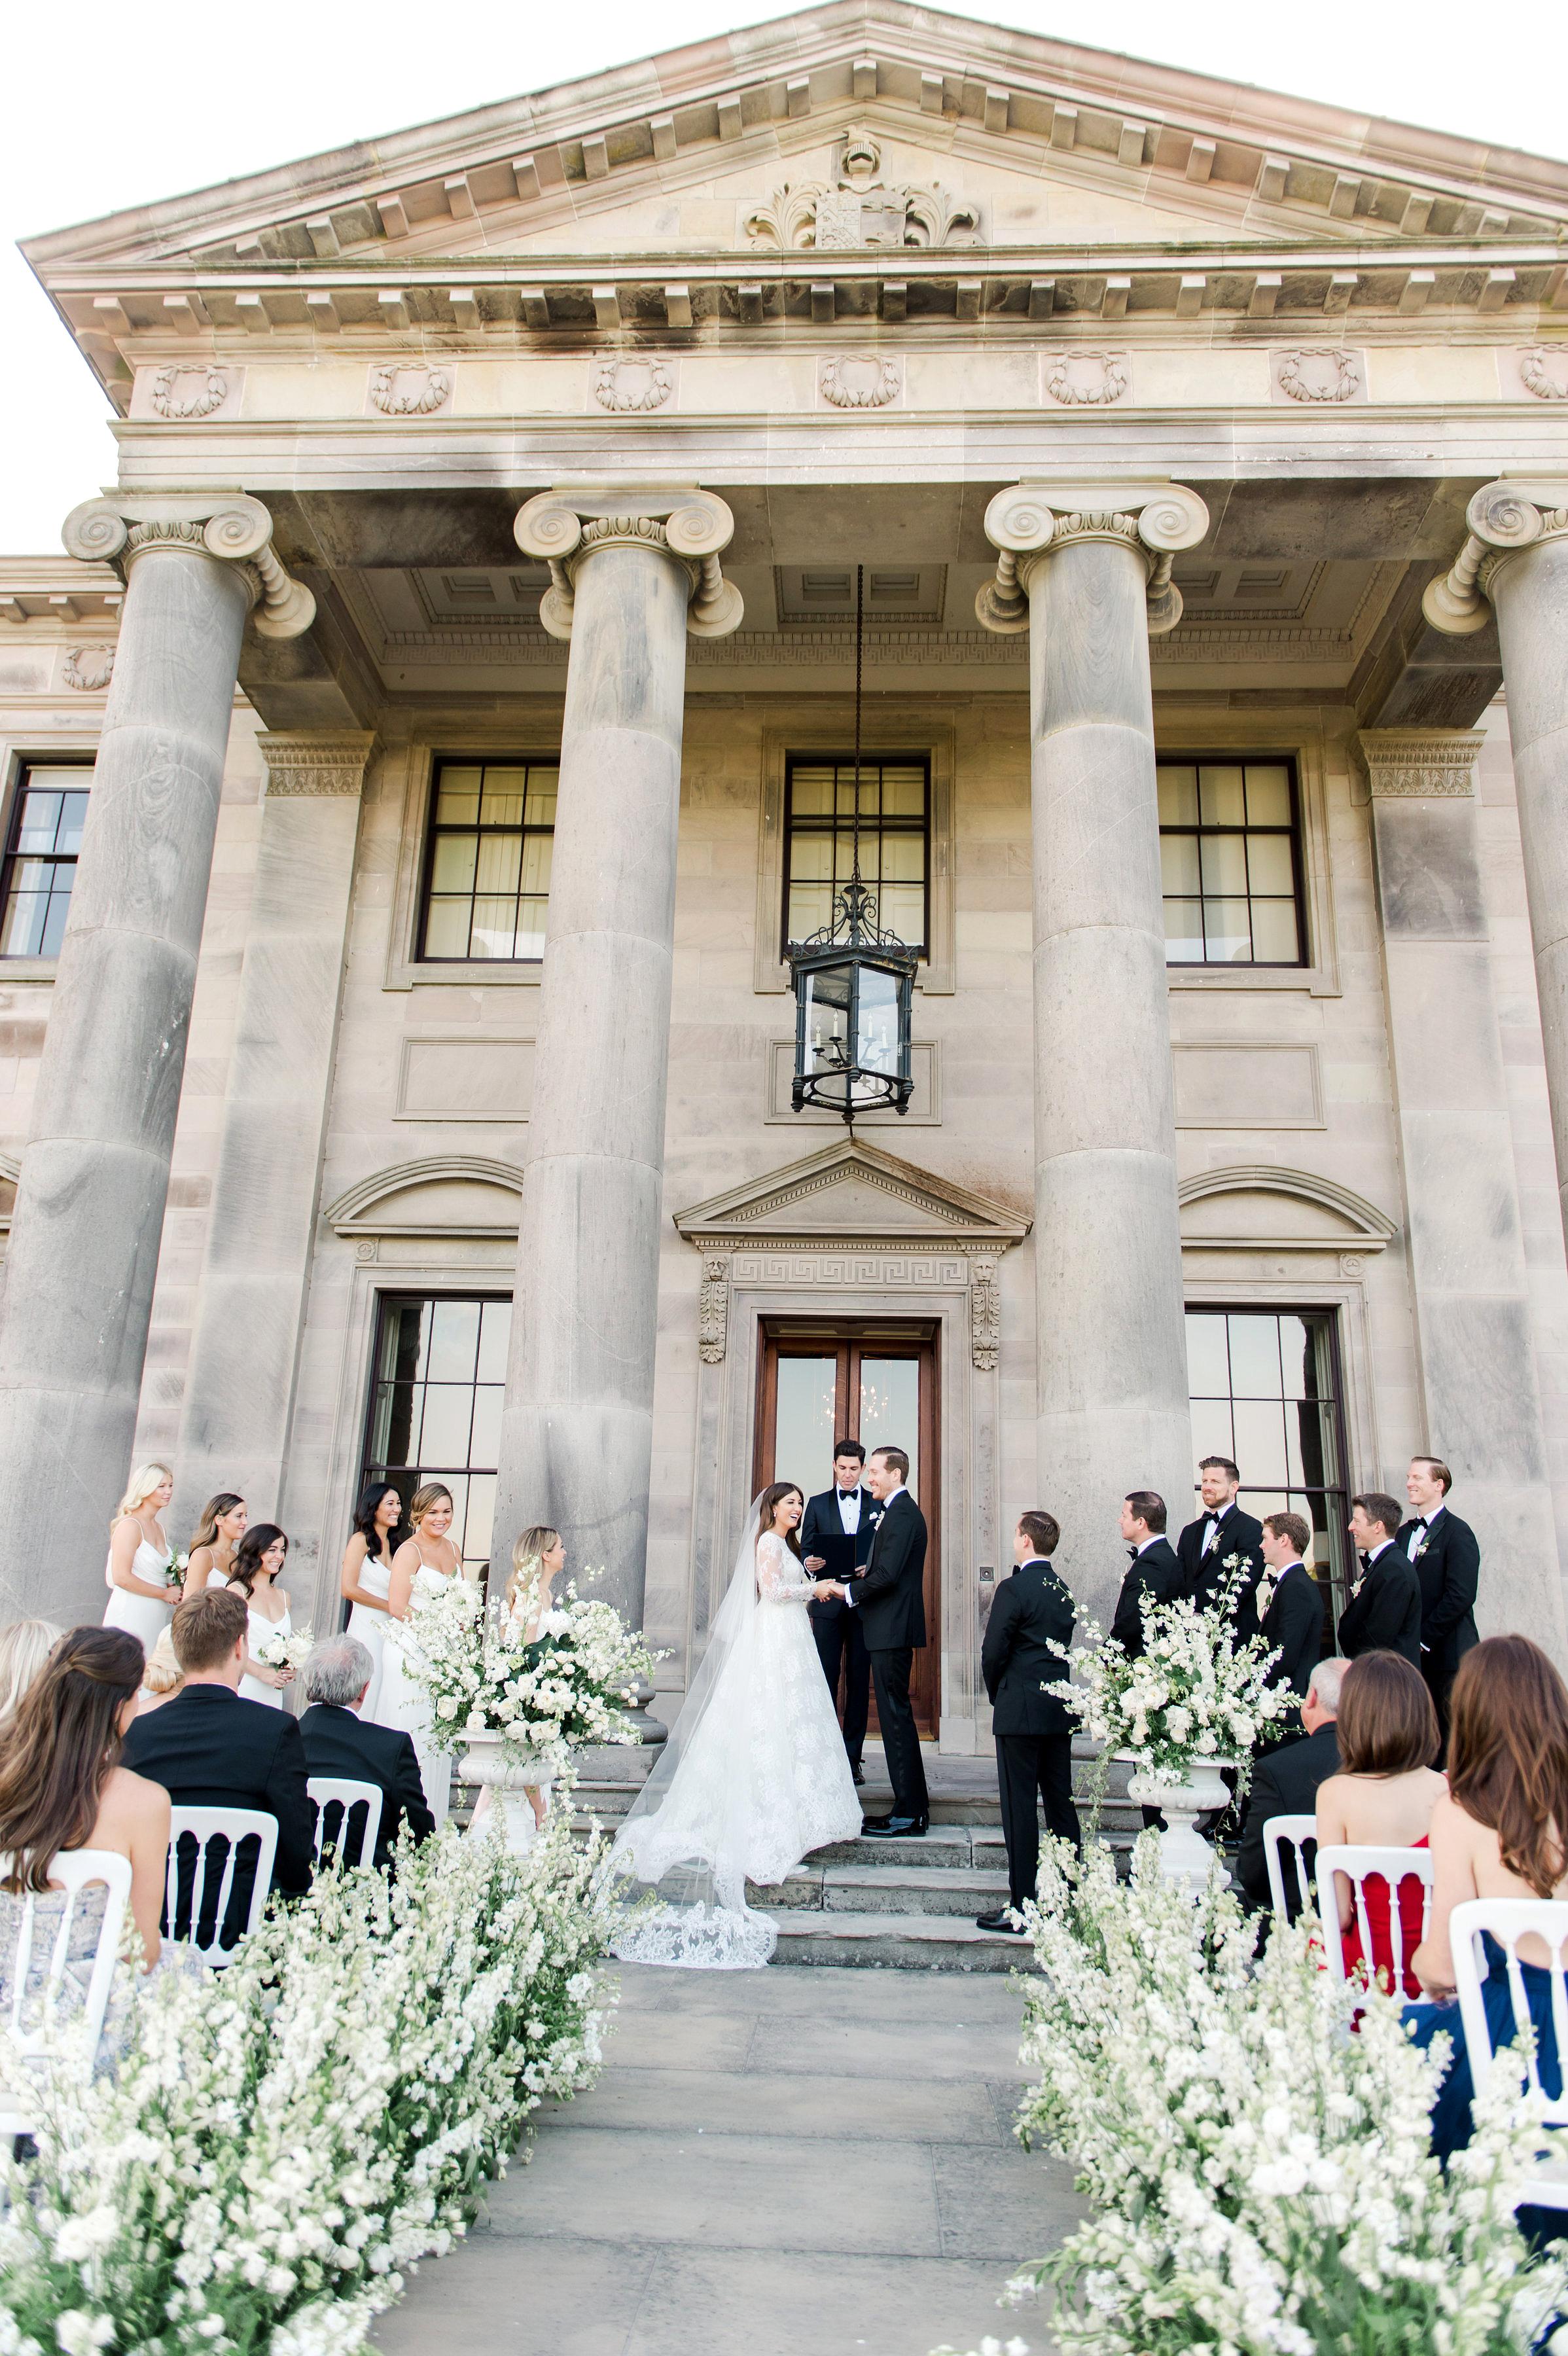 ramsey charles ireland wedding ceremony bride groom and guests